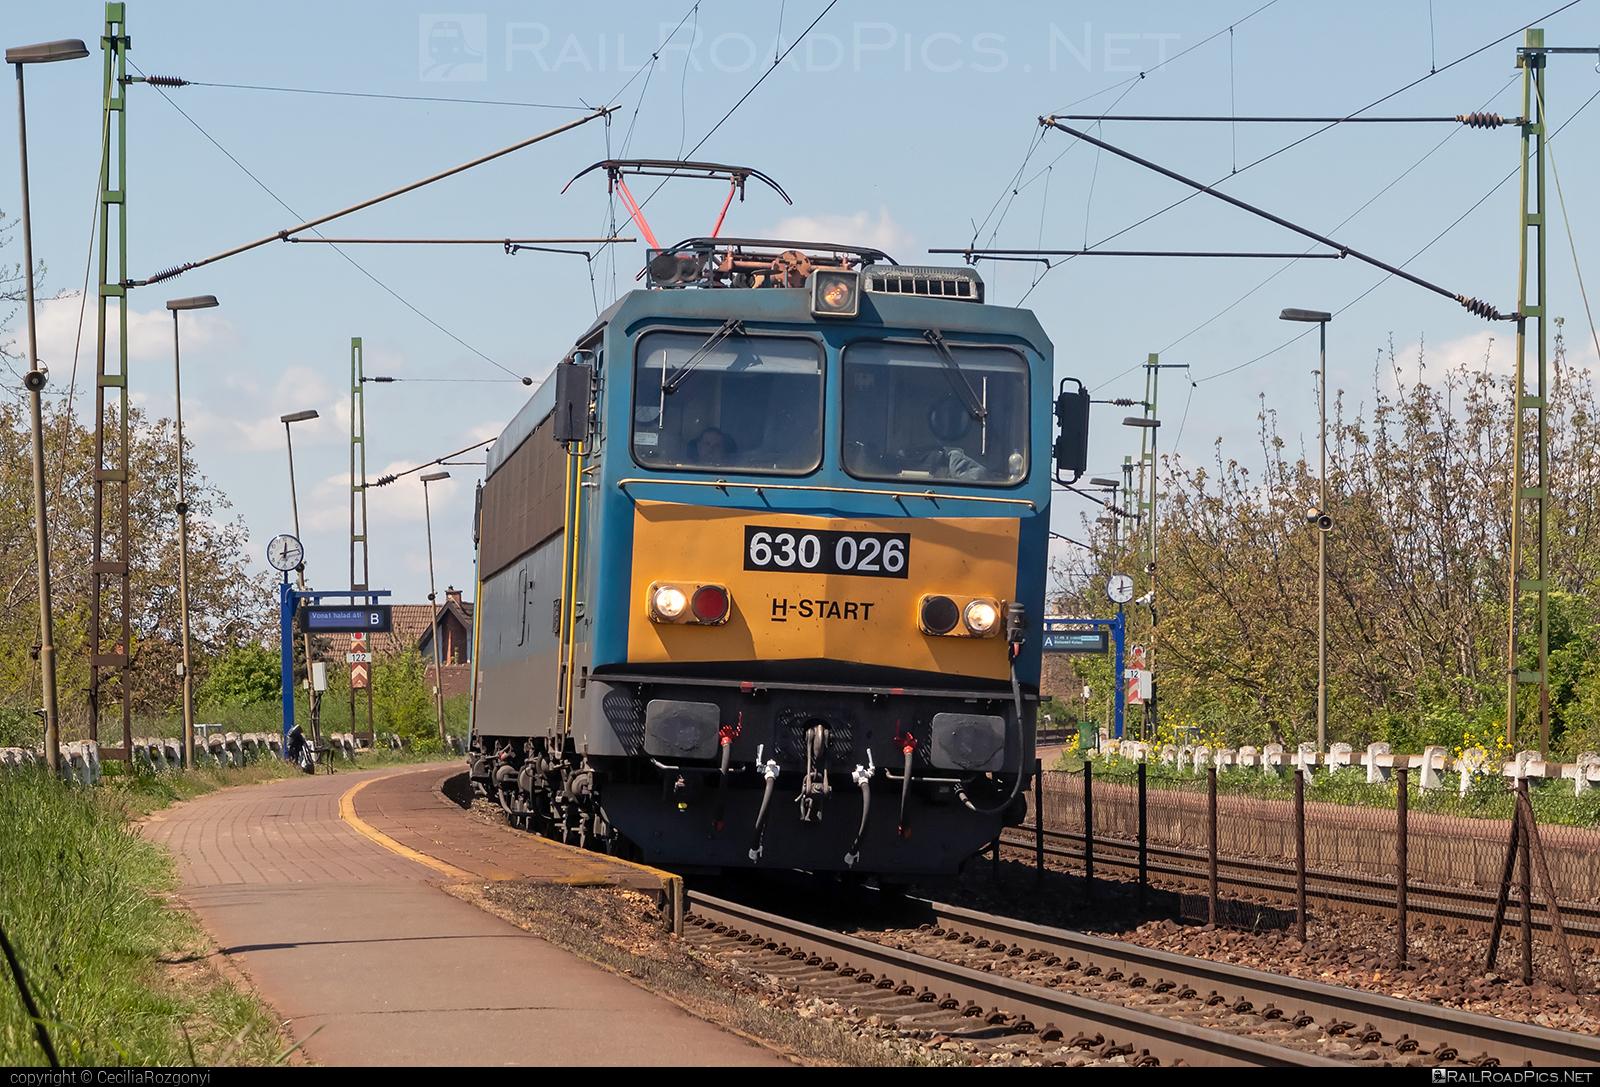 Ganz-MÁVAG VM15-3 - 630 026 operated by MÁV-START ZRt. #ganz63 #ganz630 #ganzmavag #ganzmavag63 #ganzmavag630 #ganzmavagvm153 #locomotive630 #mav #mavstart #mavstartzrt #v63locomotive